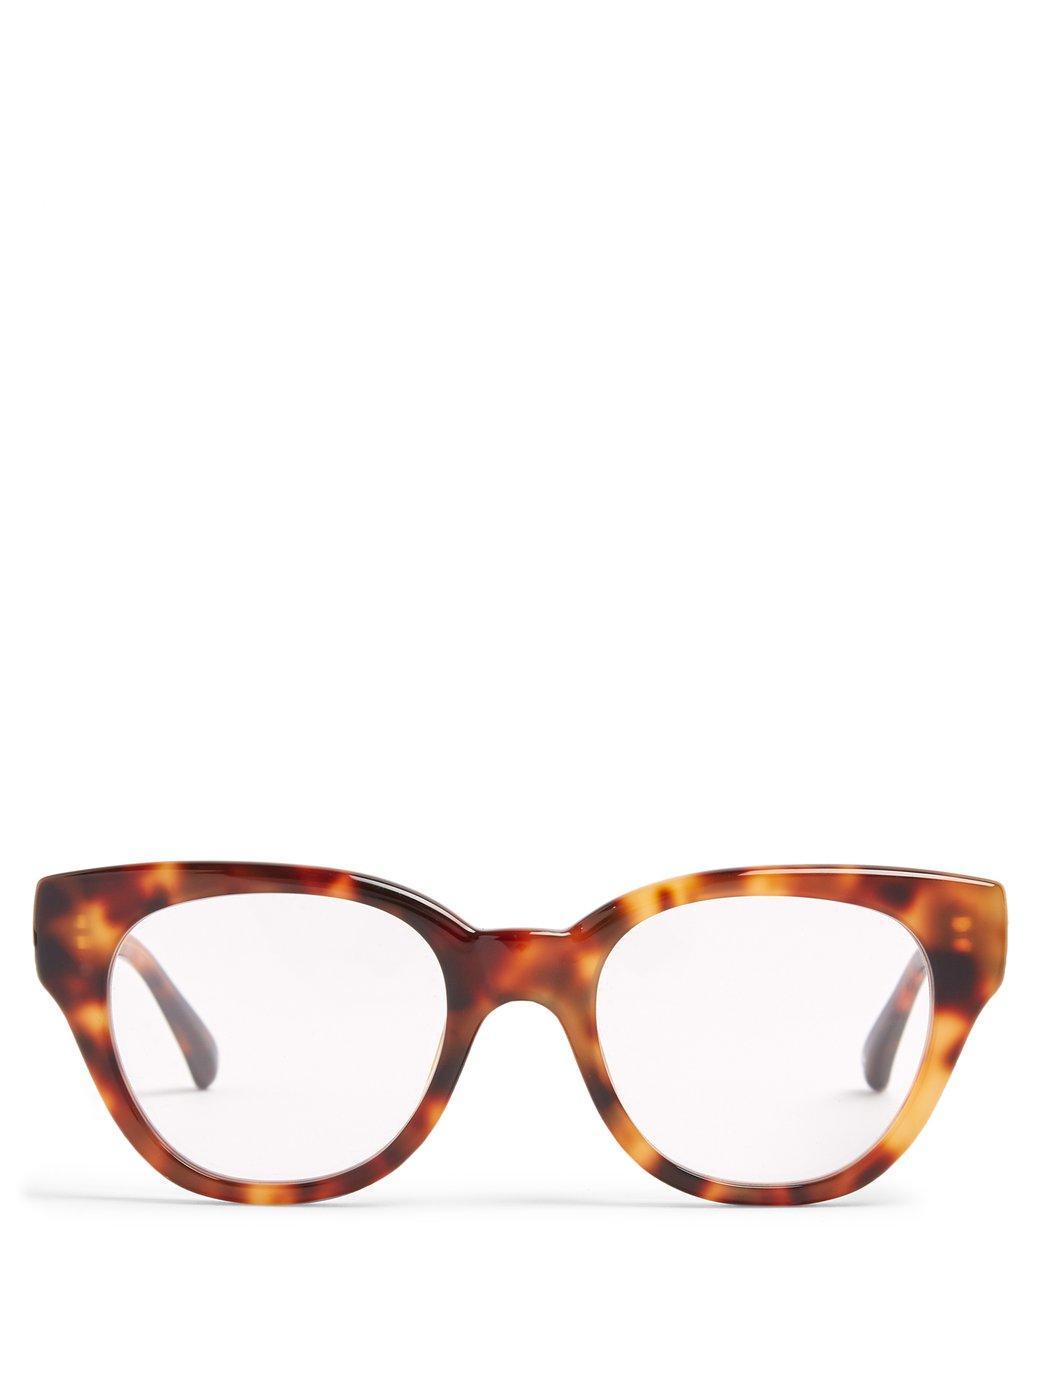 5b6f1ca89a2 The Eyewear Frames to Covet